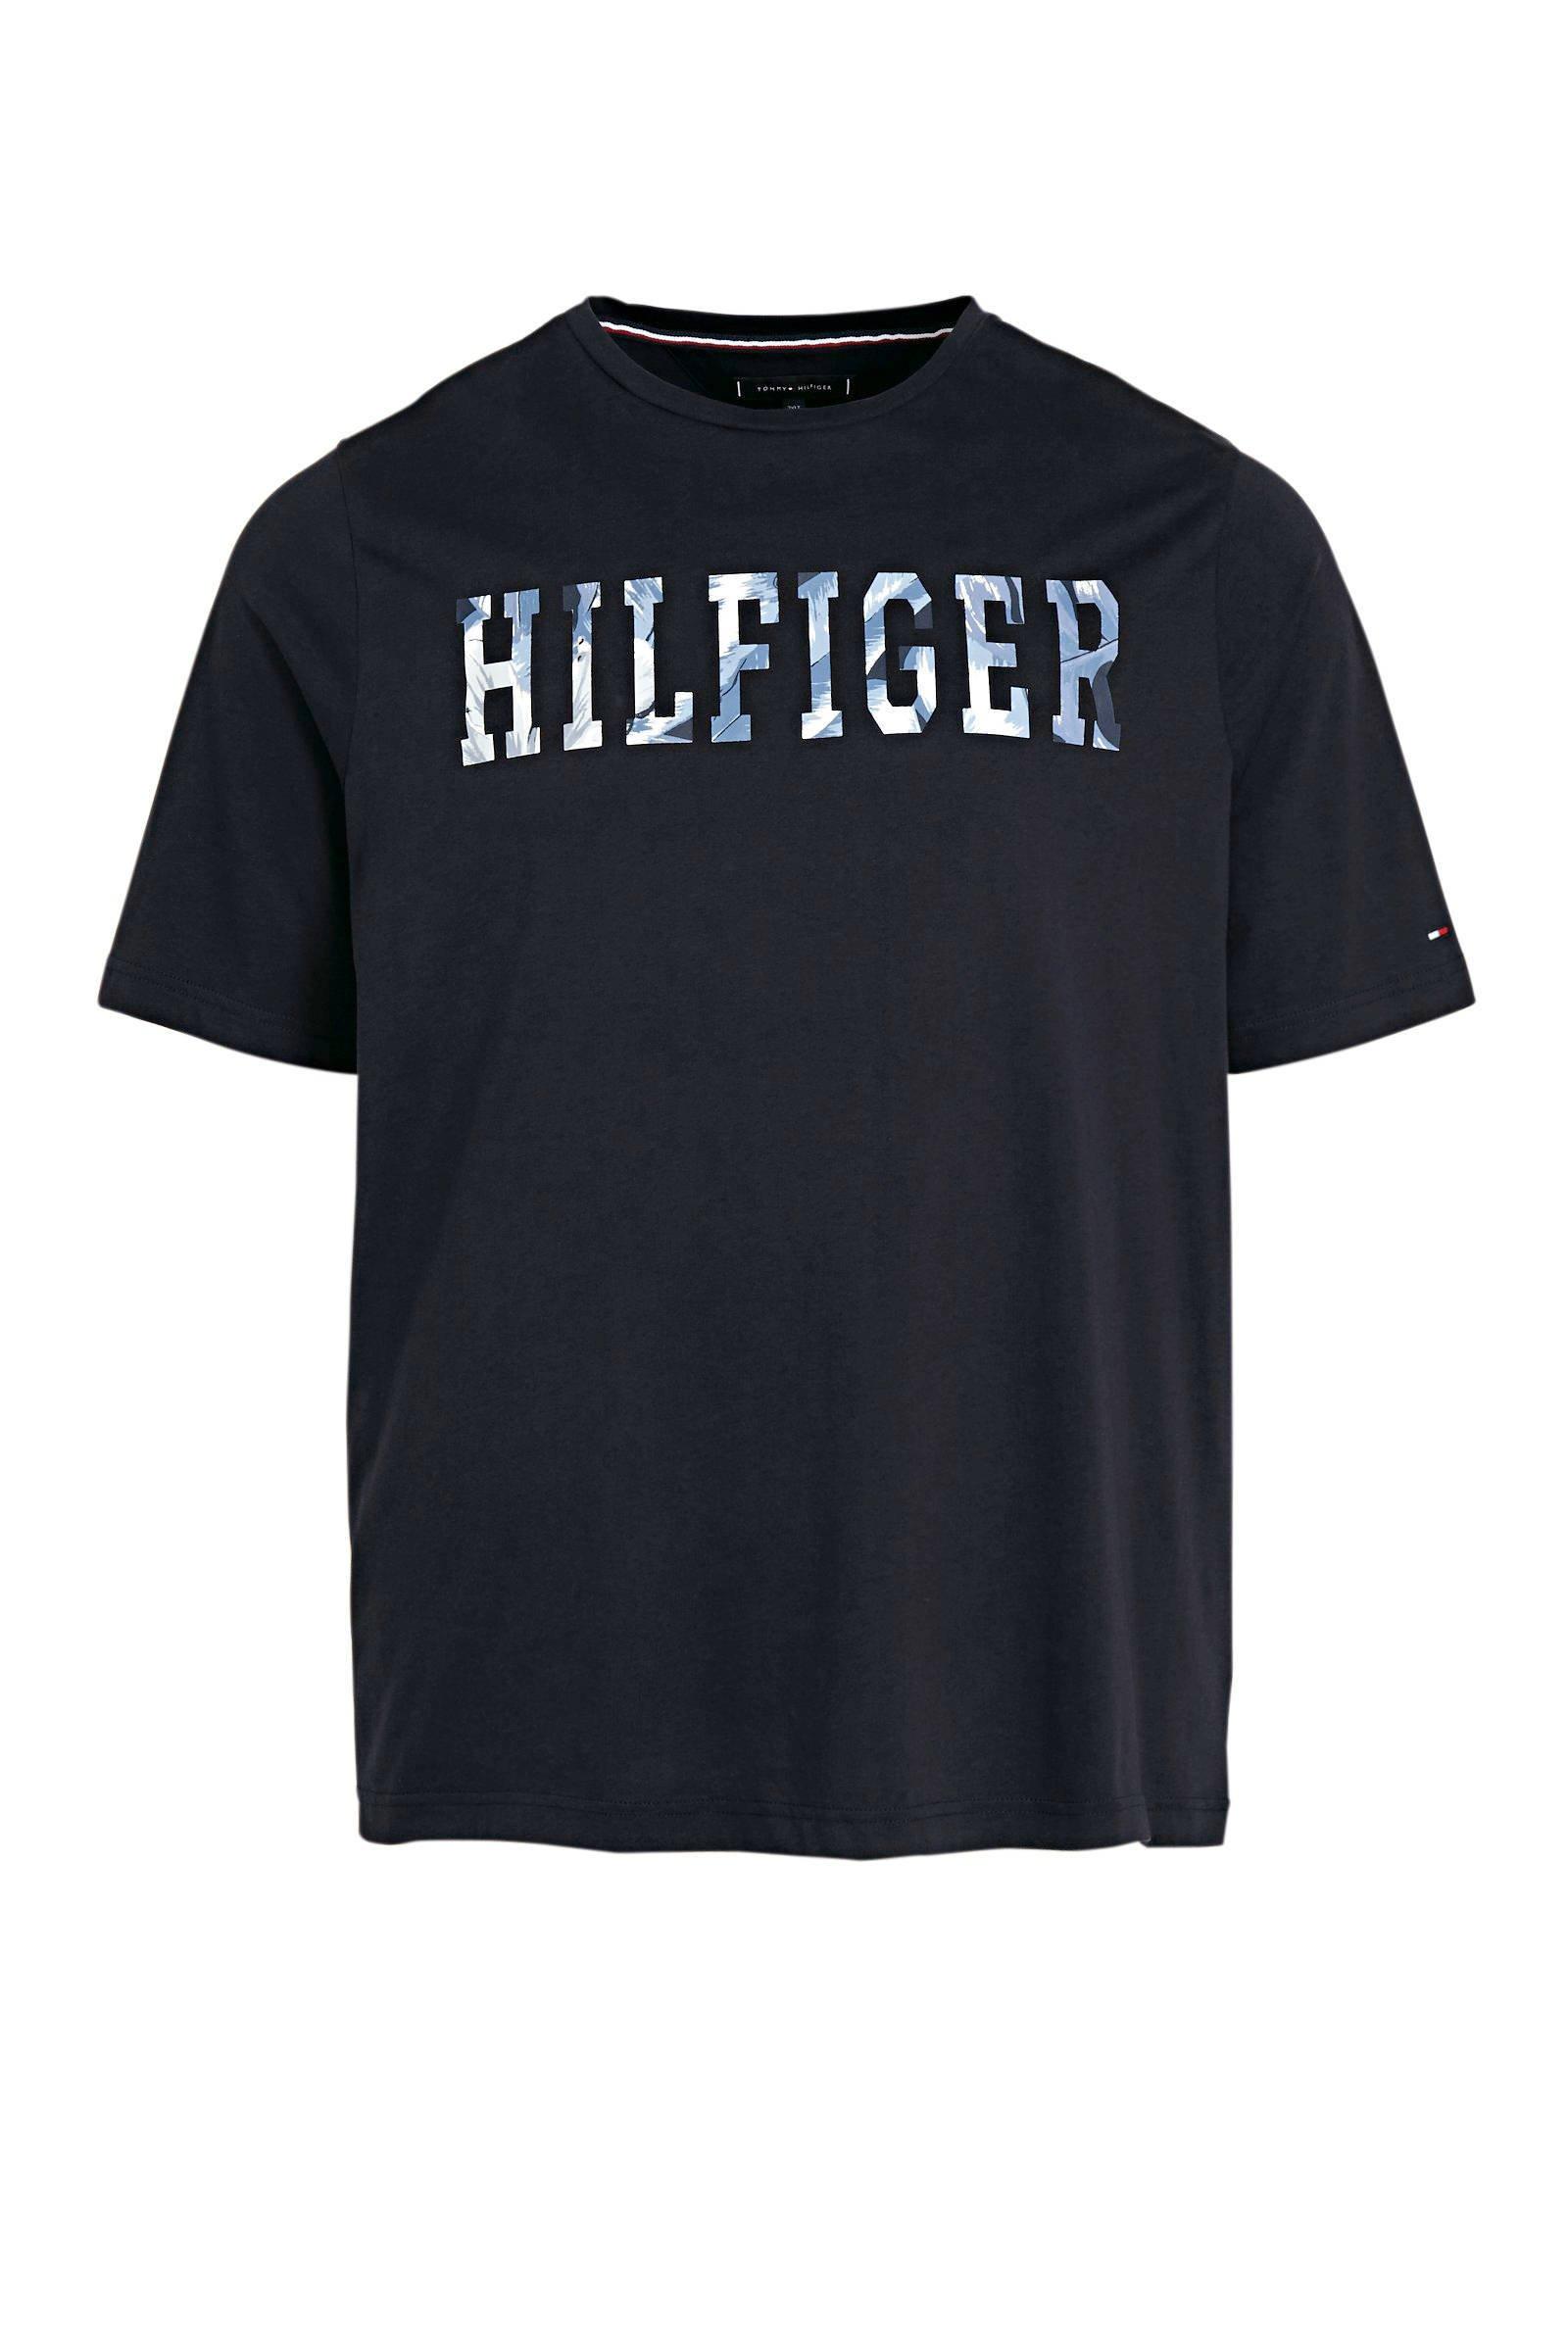 Tommy Hilfiger bij wehkamp Gratis bezorging vanaf 20.